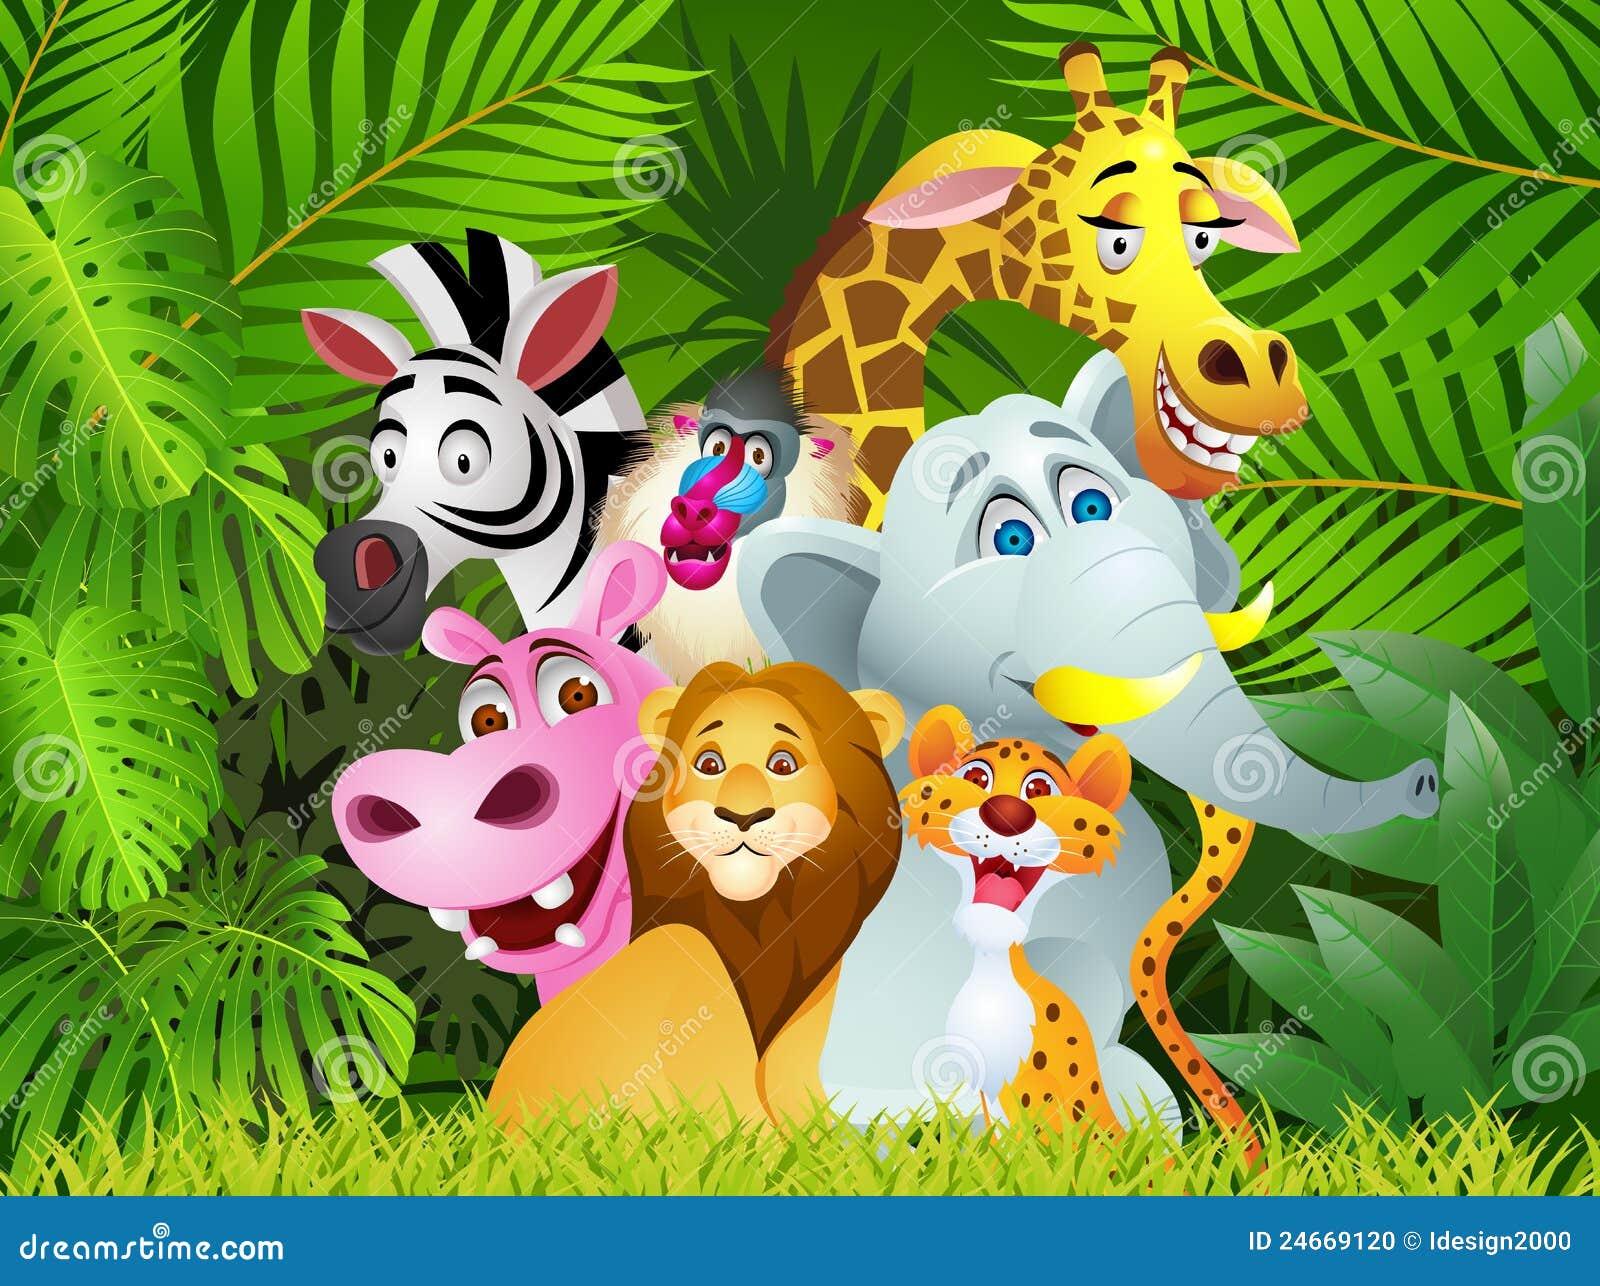 Stock Photo: Funny Animal cartoon. Image: